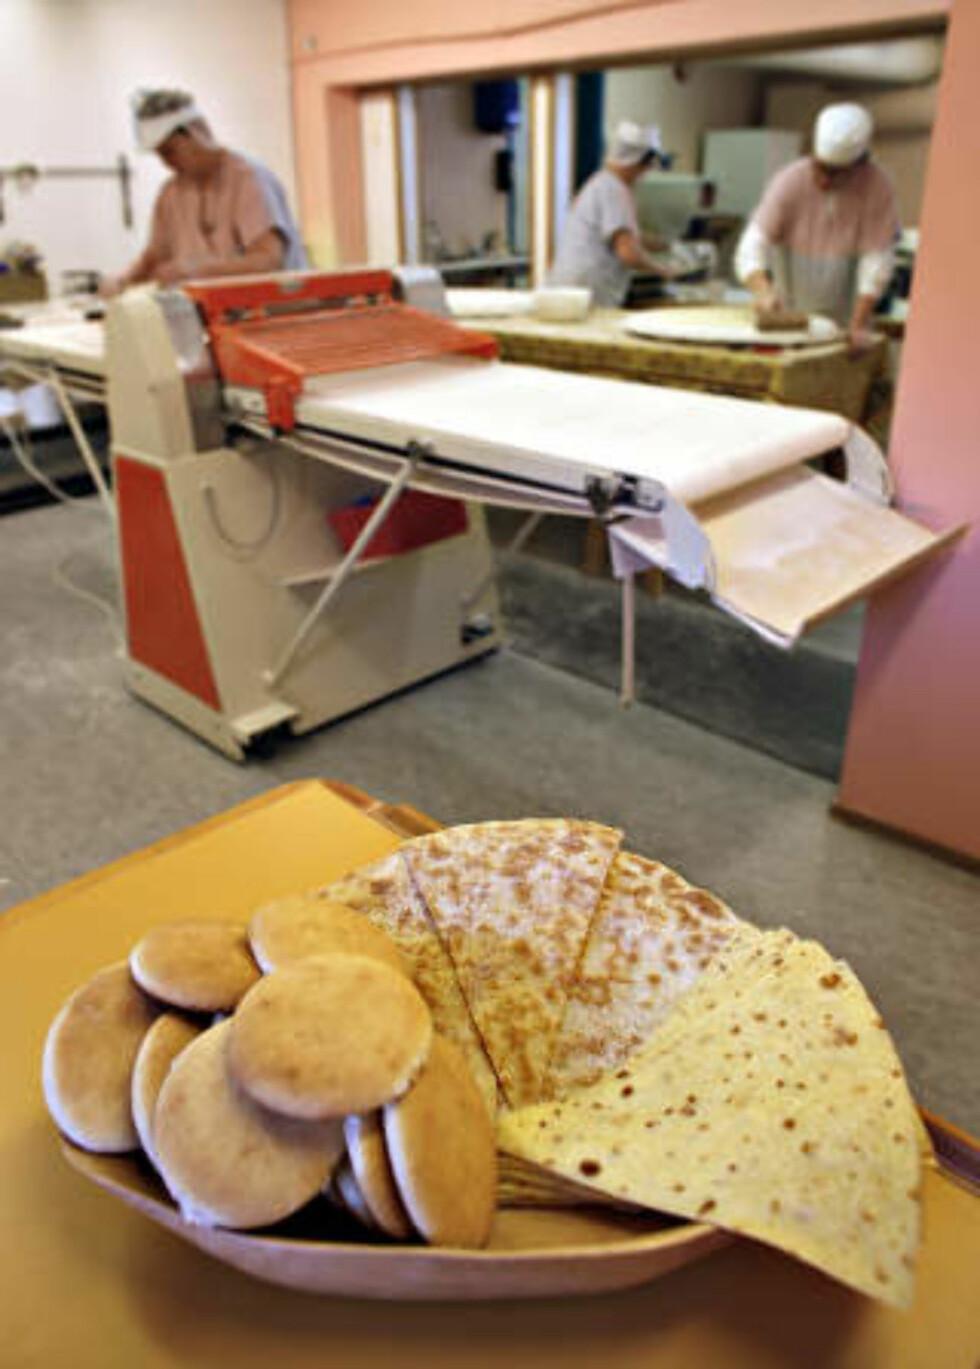 SMAKER GODT: Lefser fra Leveld Lefsebaker i Ål. Foto: Ole C. H. Thomassen/Dagbladet